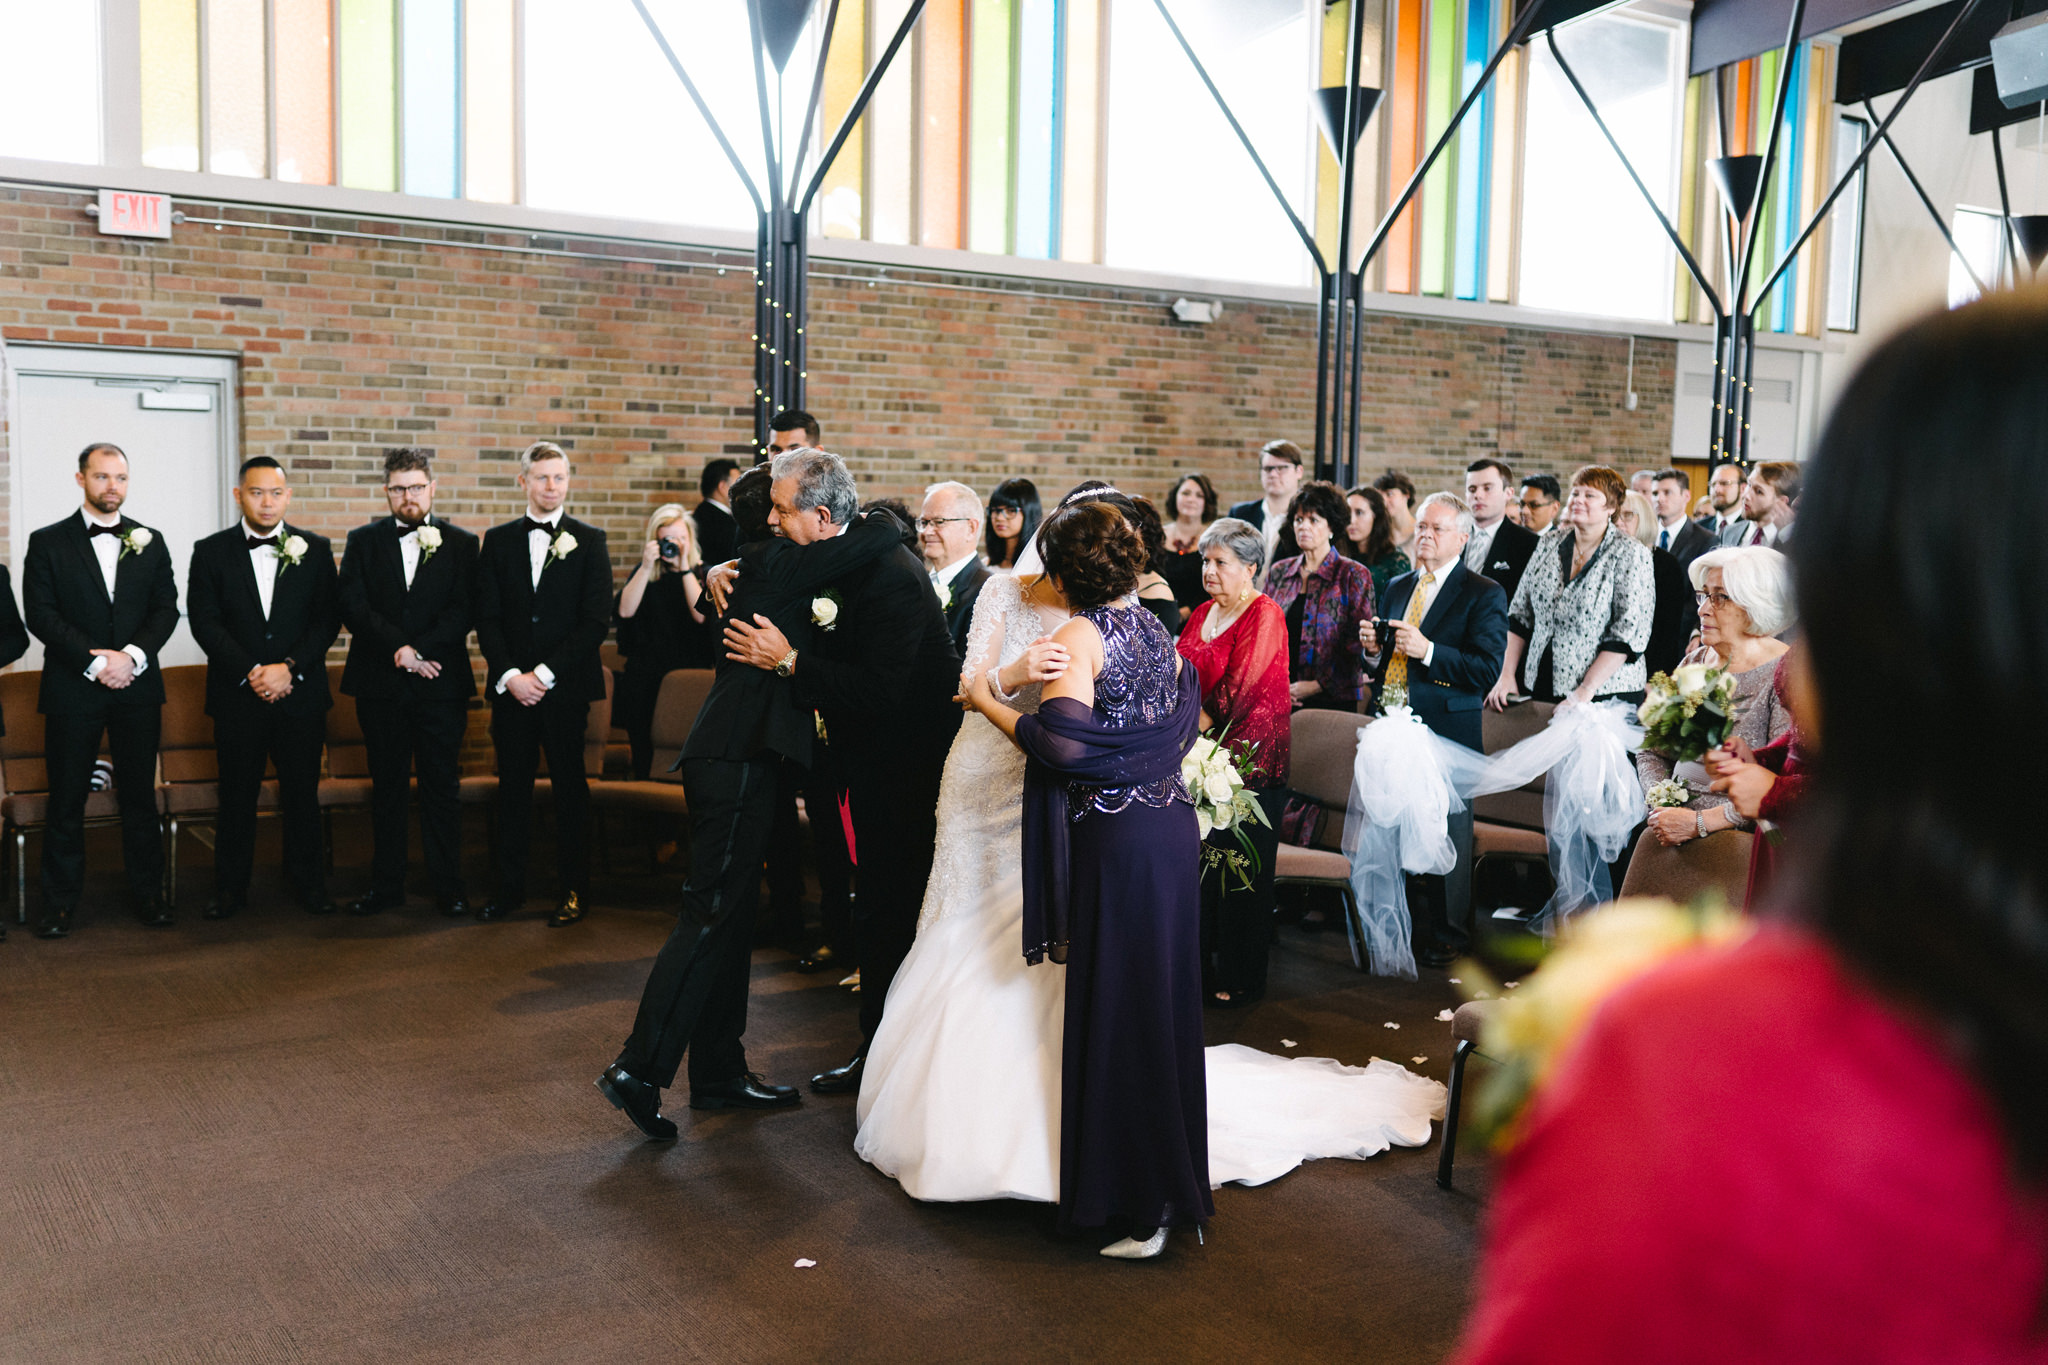 014-rempel-photography-chicago-wedding-inspiration-susan-daniel-michigan-metro-detroit-christian-church-holly-vault-cupcakes-and-kisses.jpg